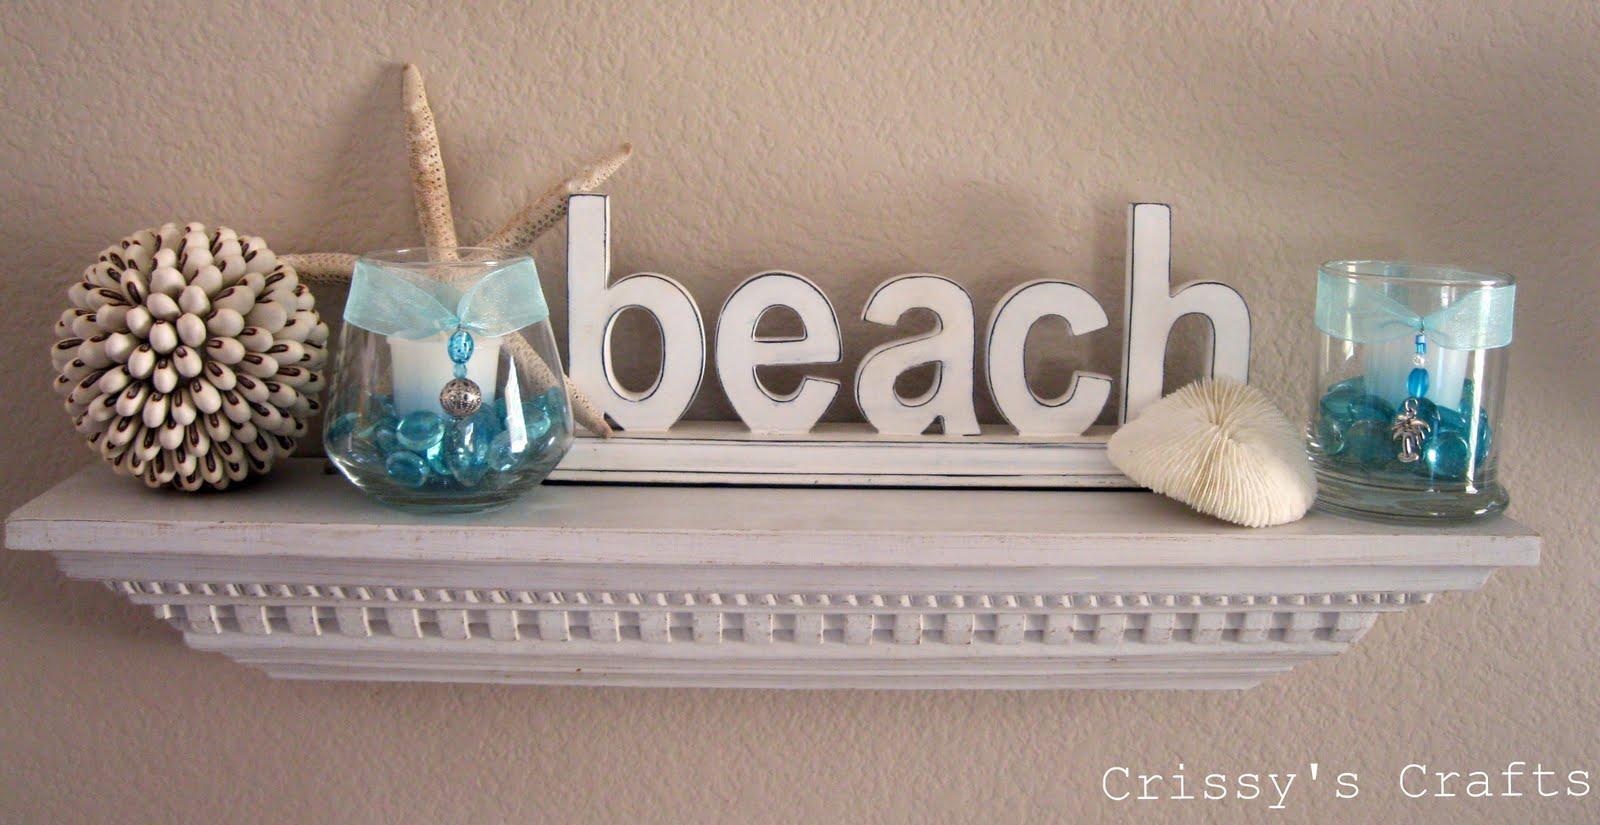 Crissy's Crafts: Beach Mantel